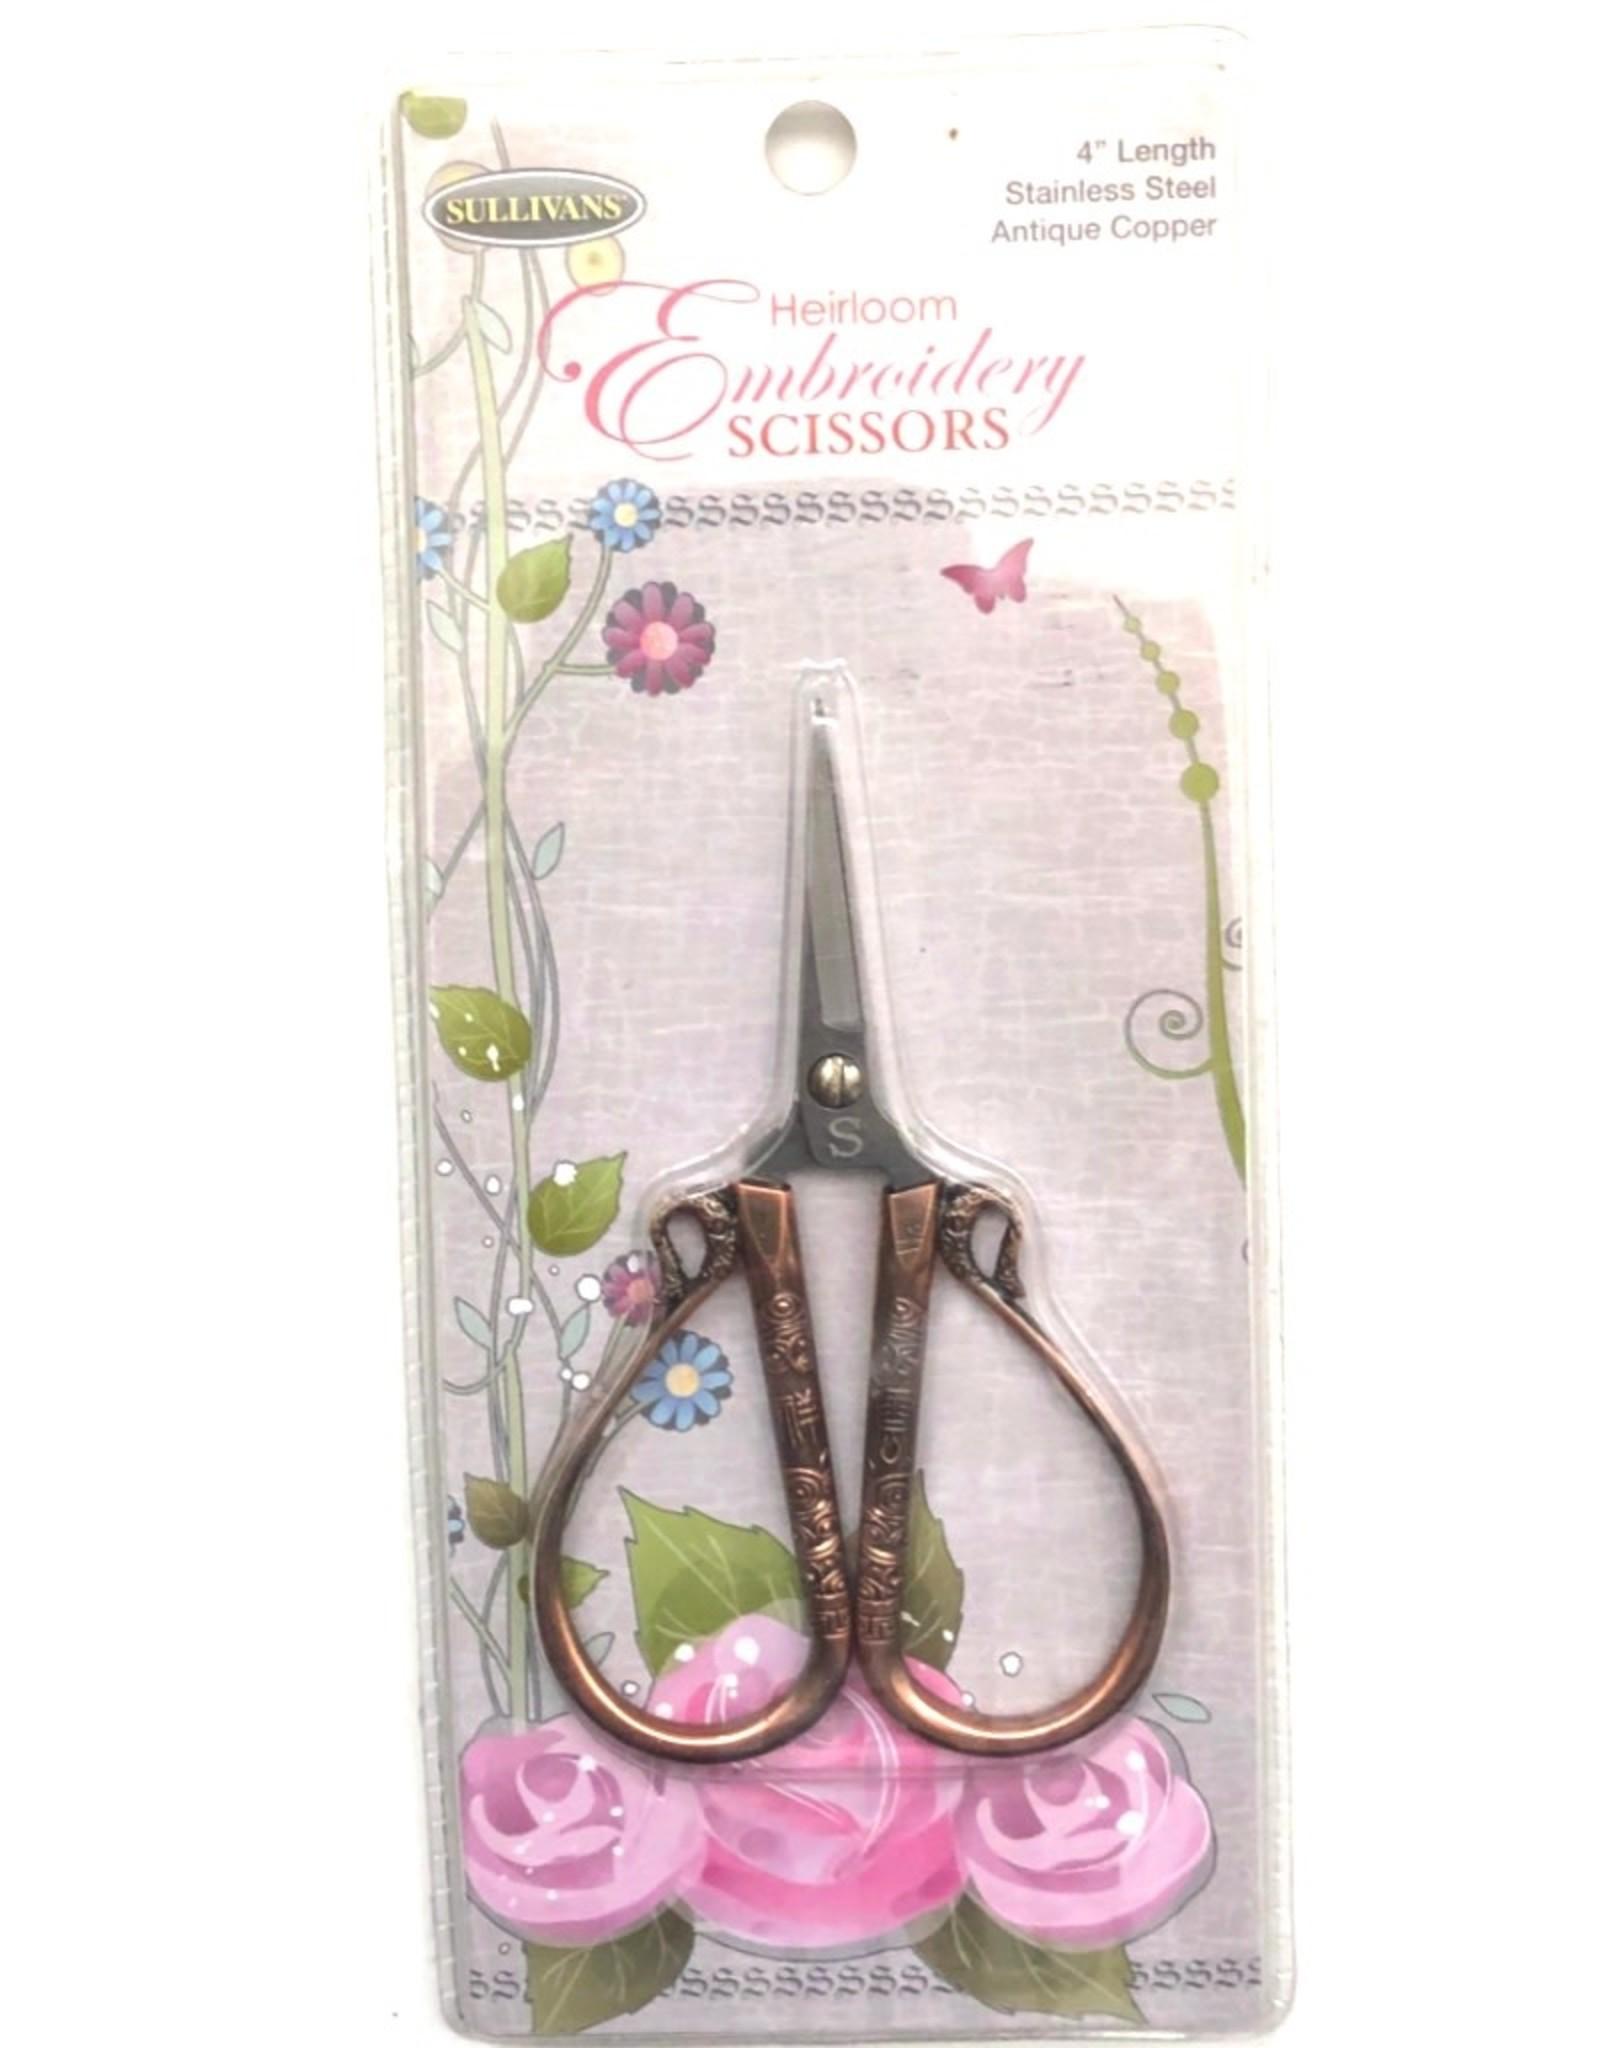 Sullivans Sullivans Embroidery Scissors- Antique Copper